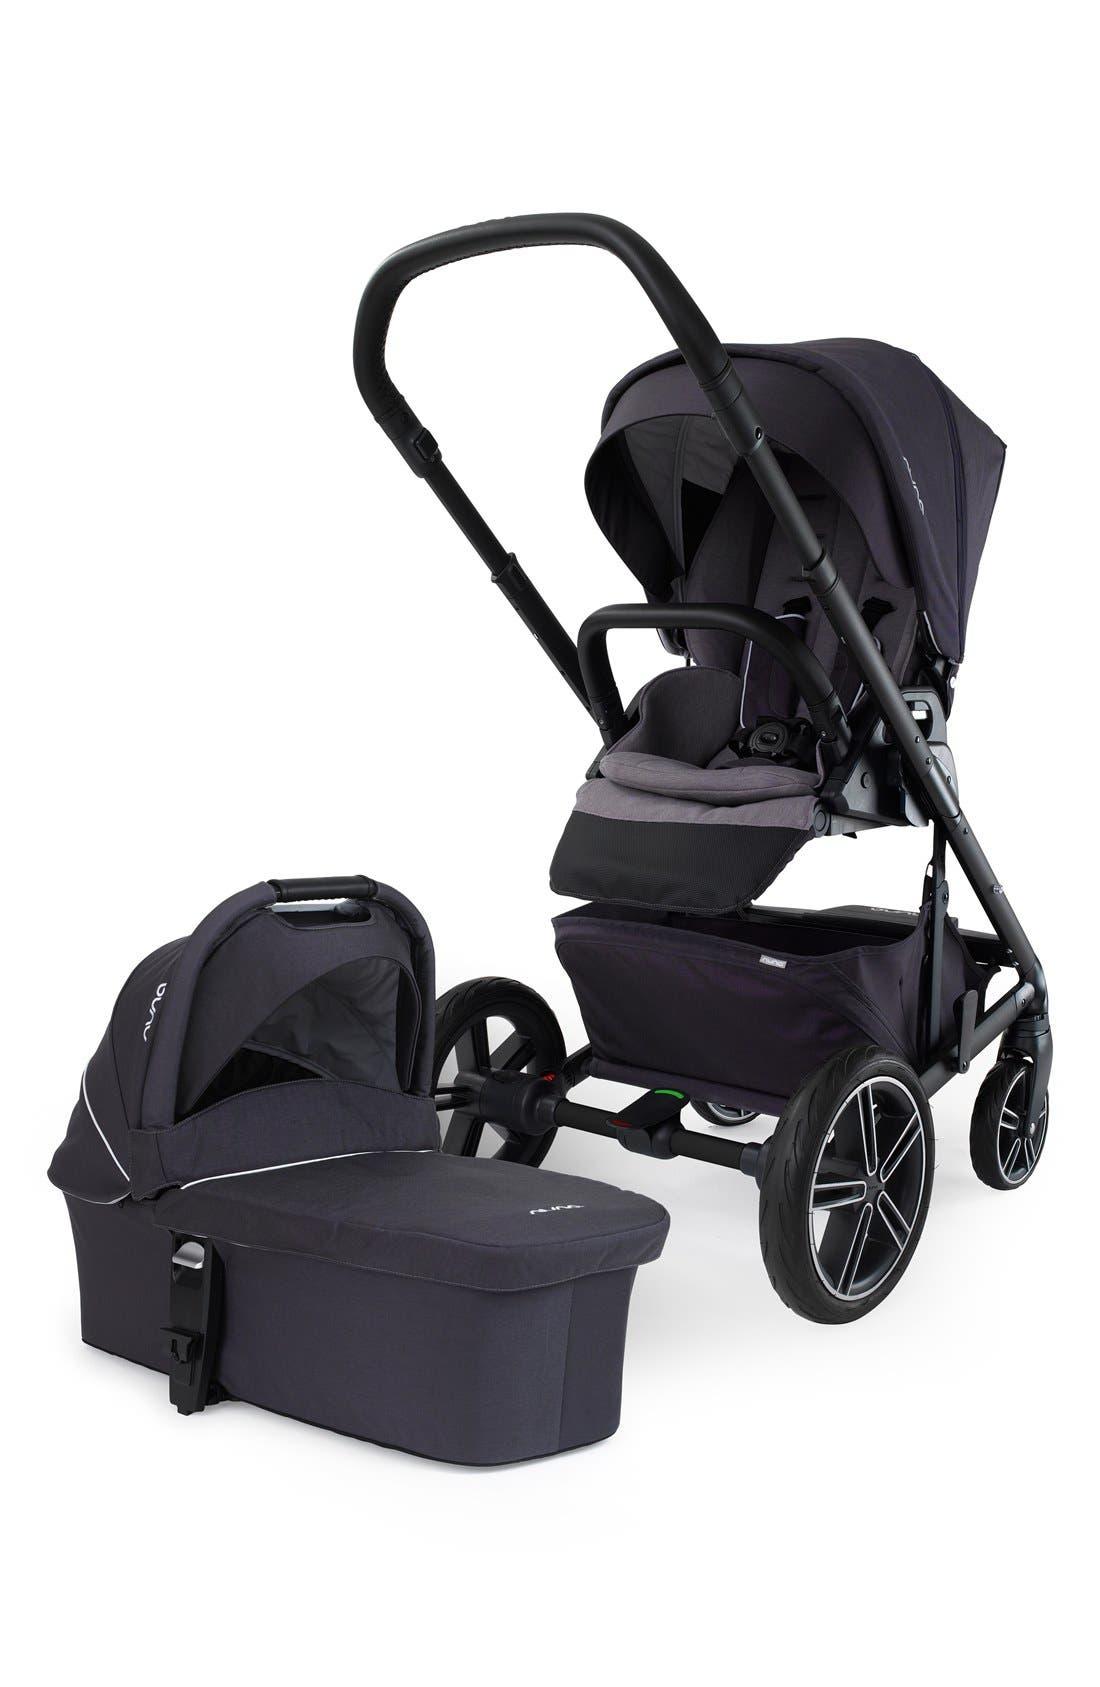 MIXX Single Stroller & Bassinet,                             Main thumbnail 1, color,                             002